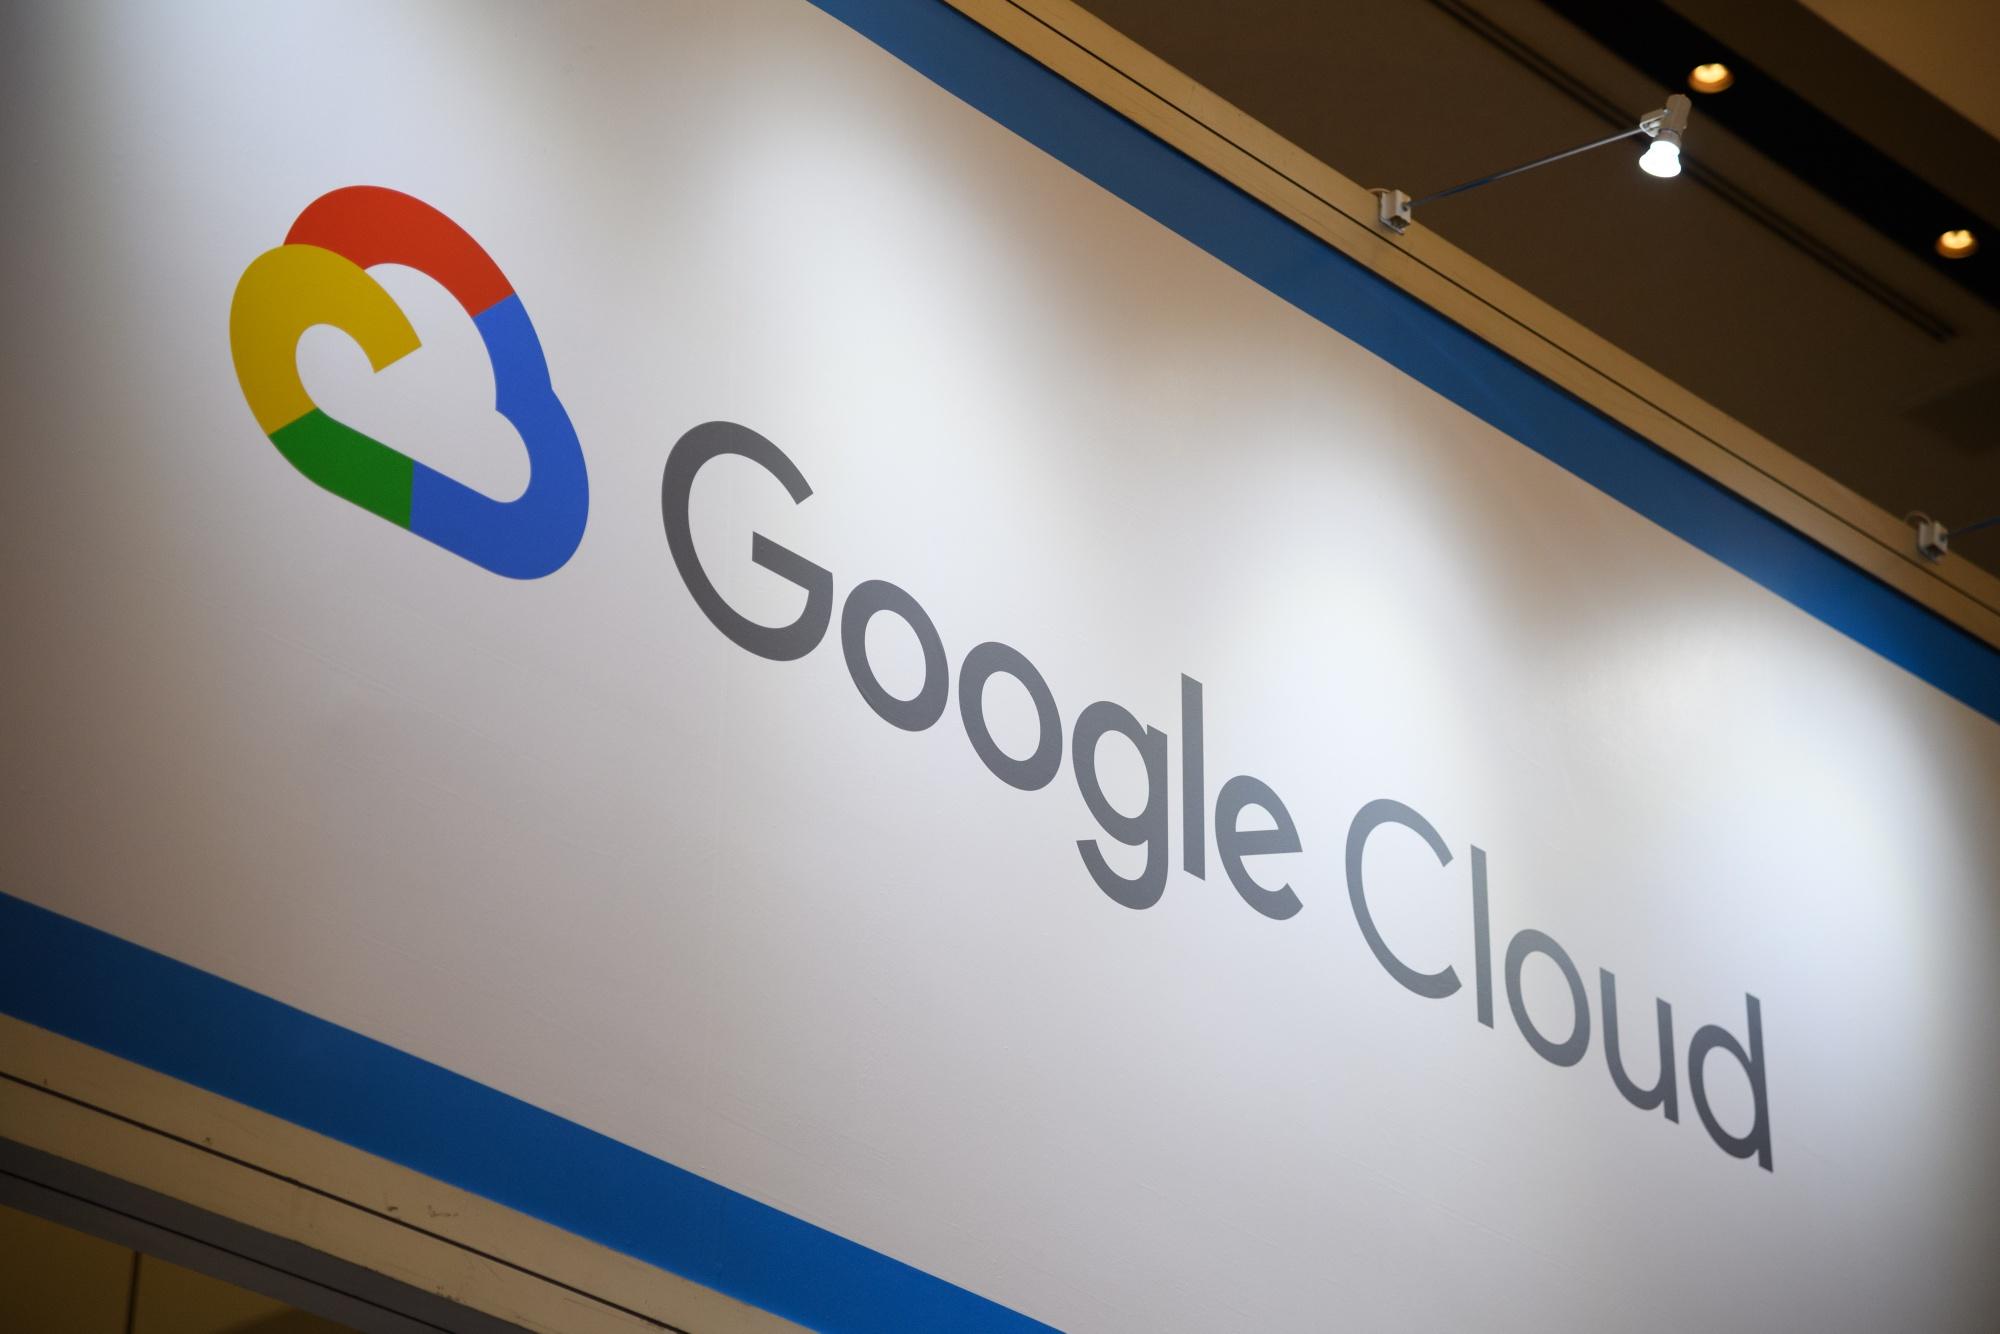 Google's Aramco Deal Risks Irking Staff Over Oil, Politics - Bloomberg